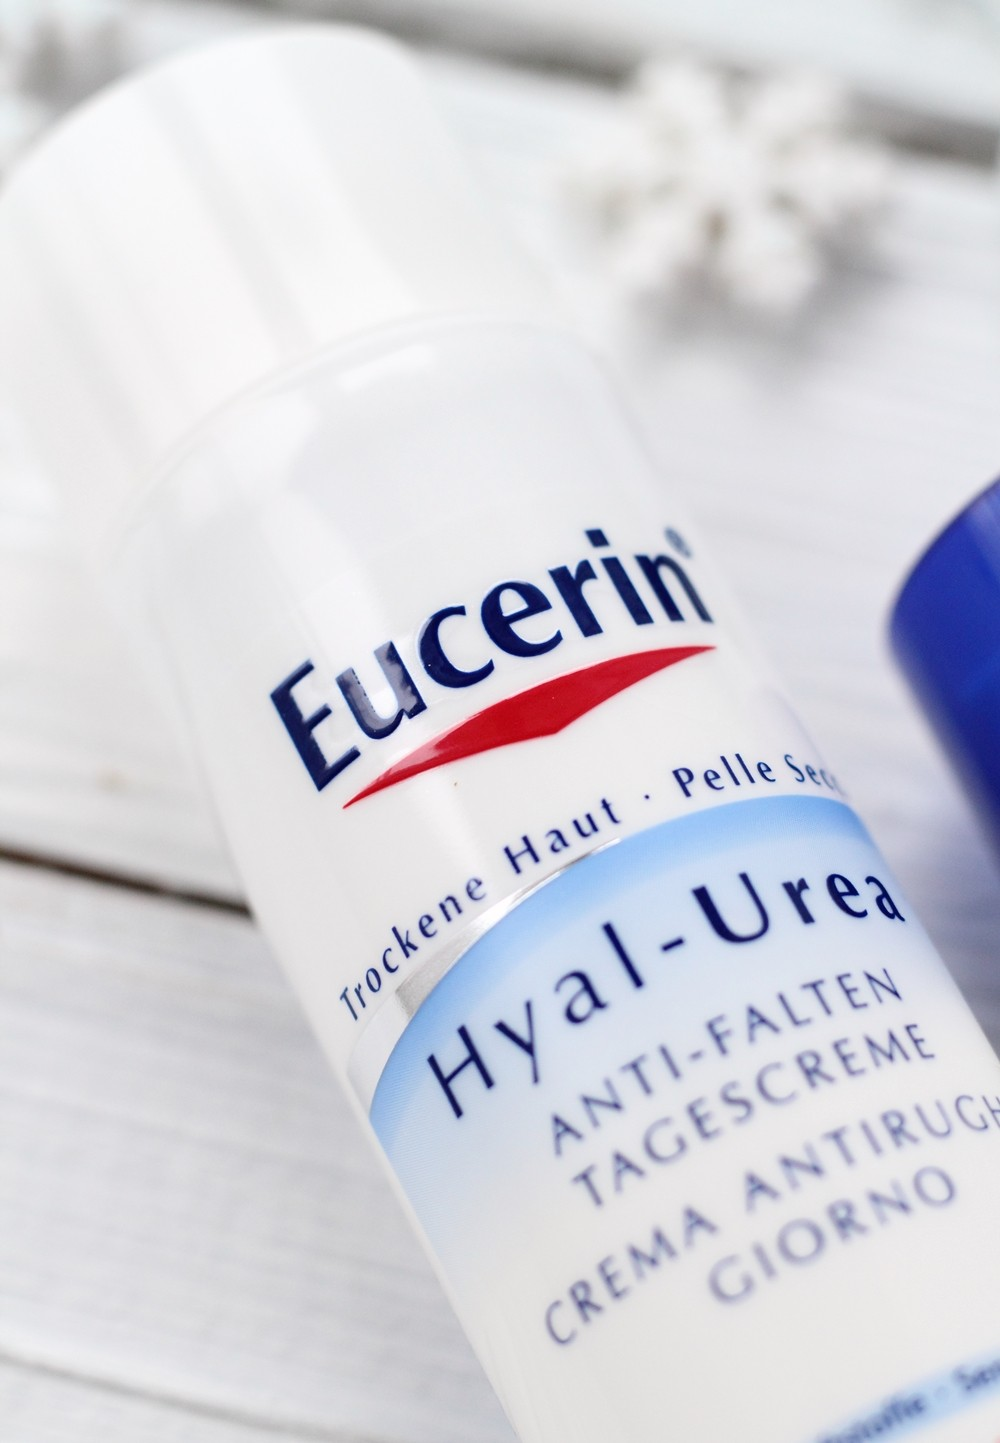 Eucerin Hyal Urea Antifalten Tagescreme rockene Haut